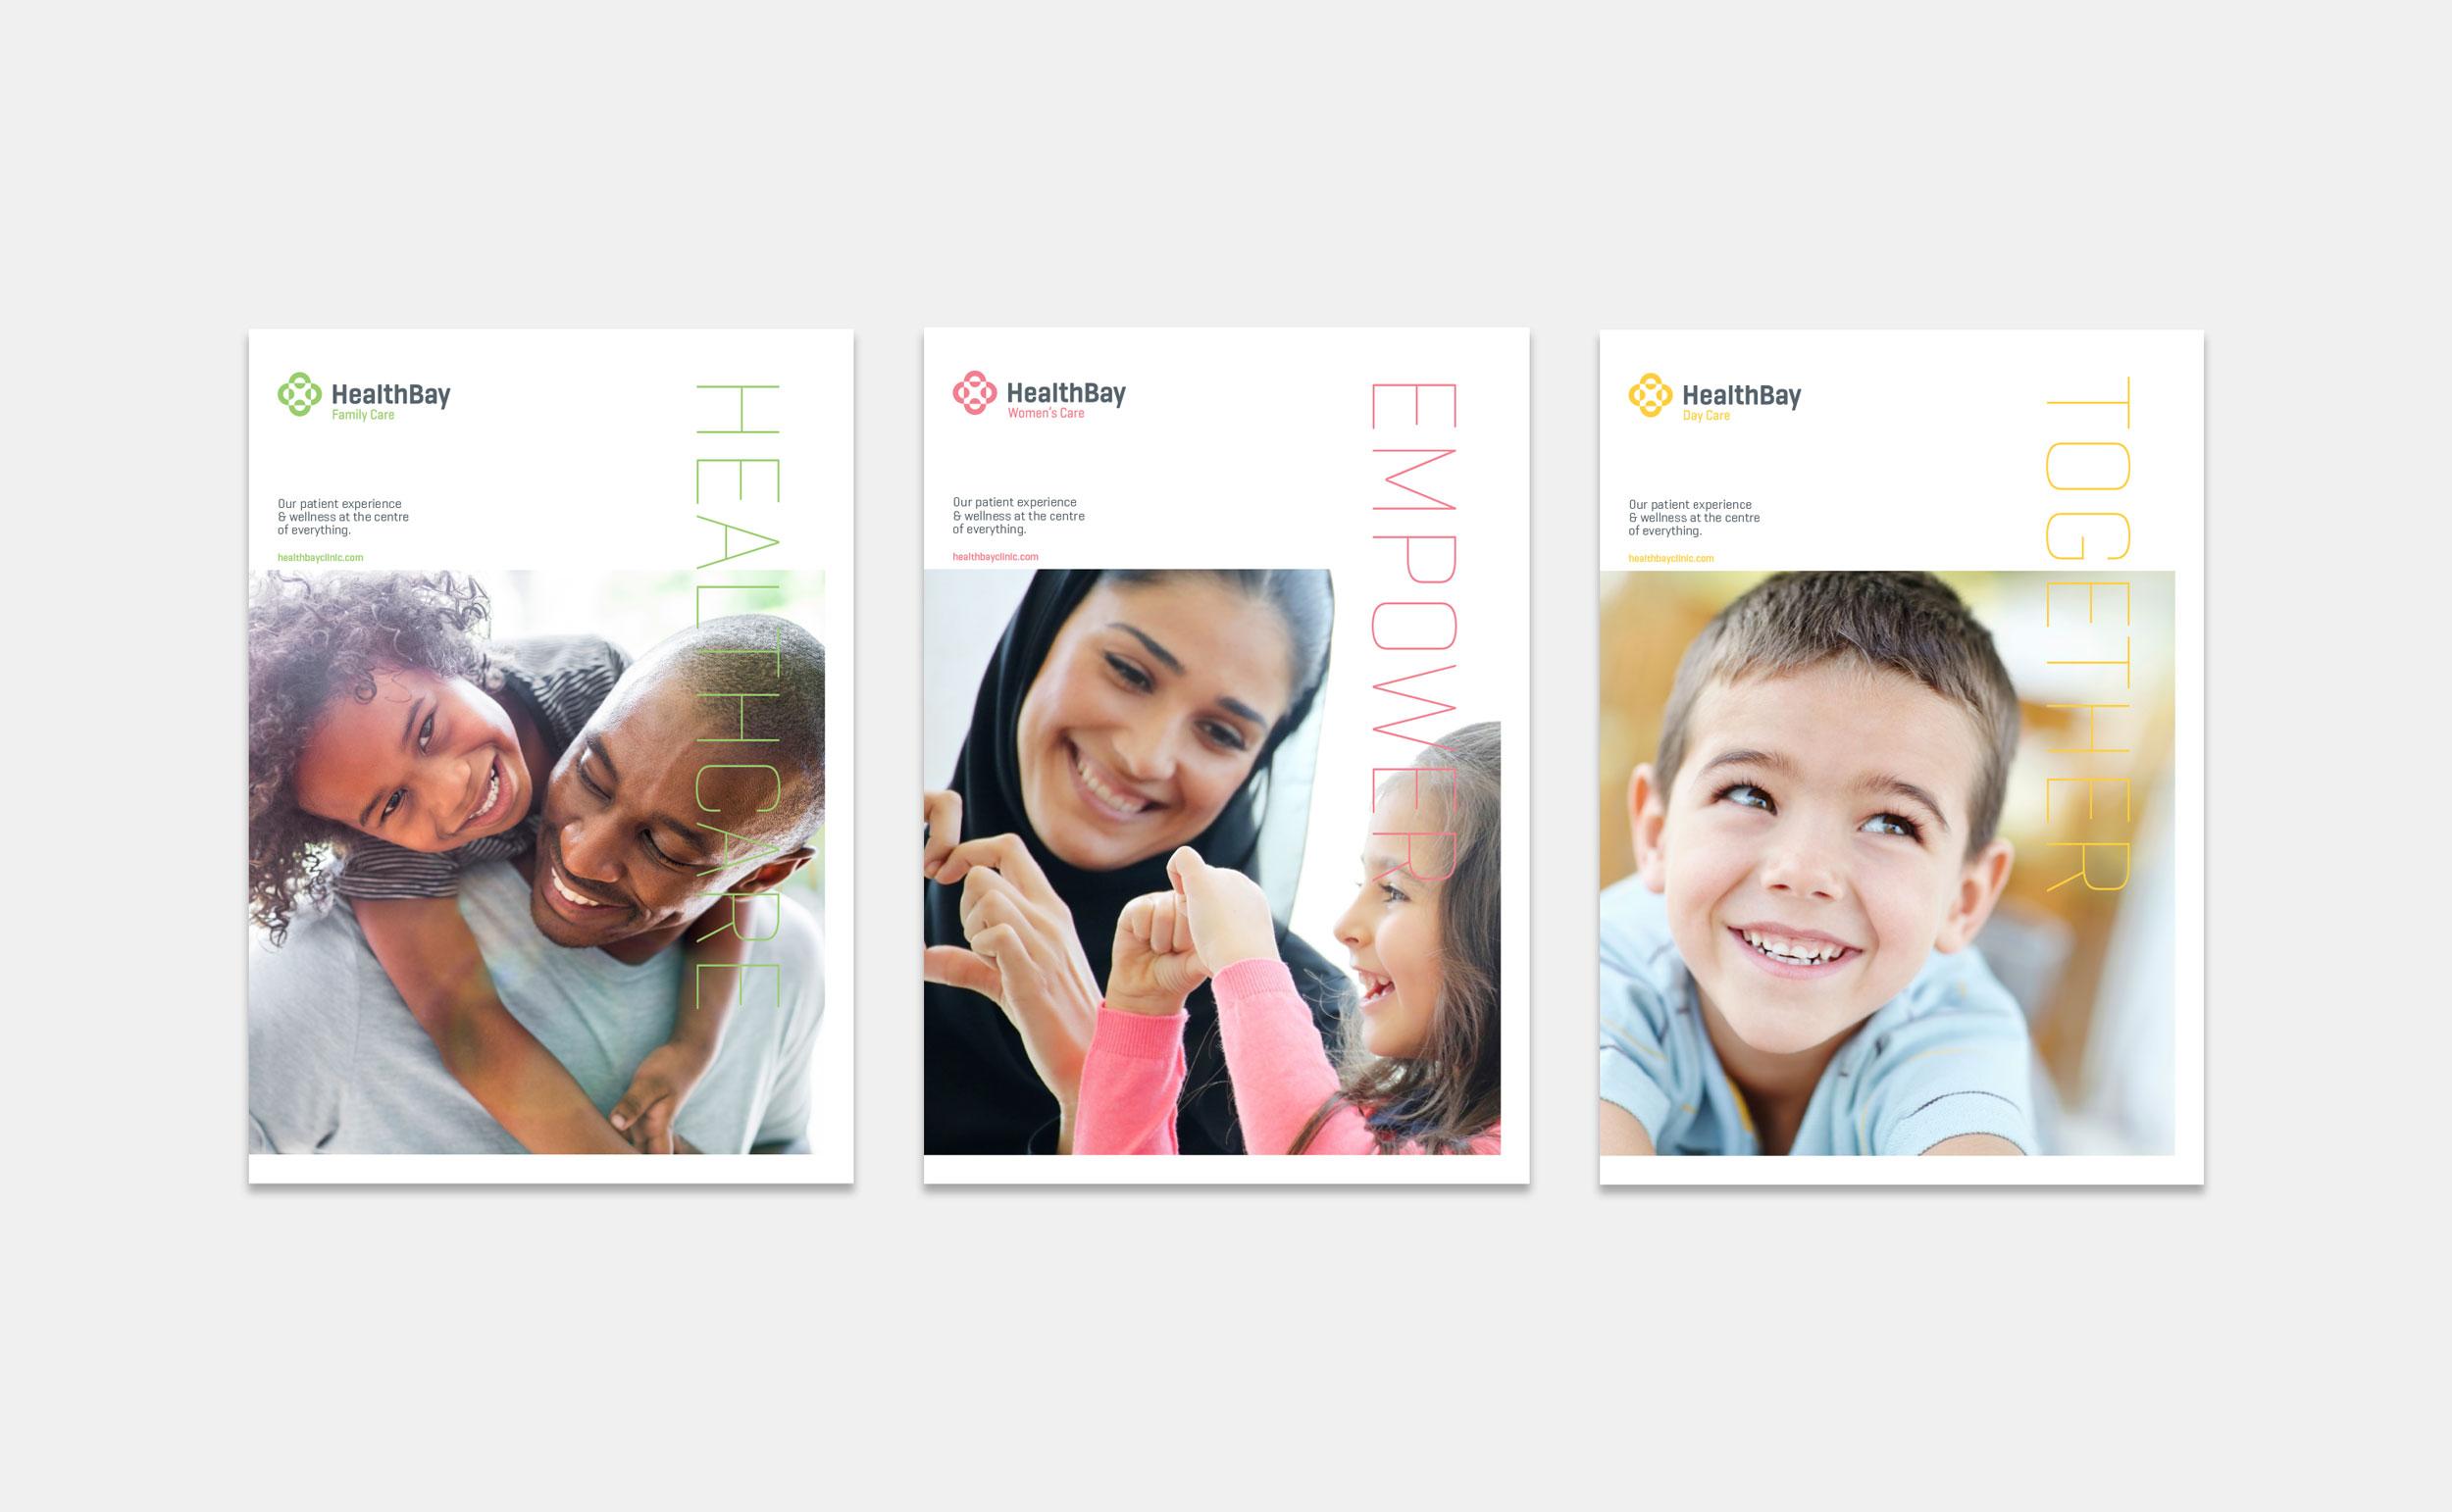 HealthBay-Clinics-Project-Visual-7